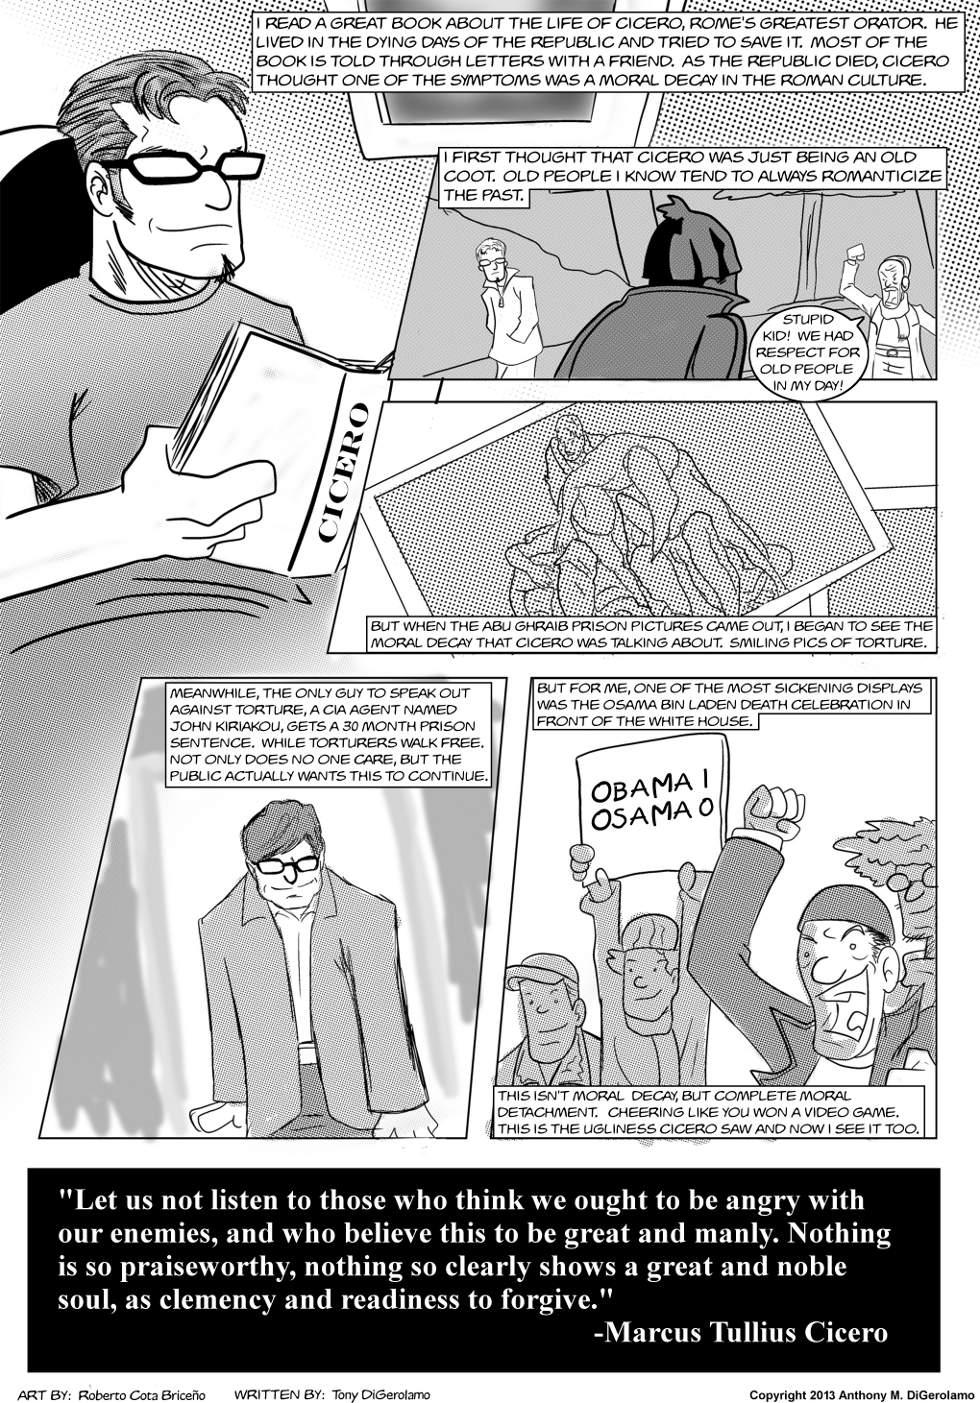 The Antiwar Comic:  Cicero's Culture Decay